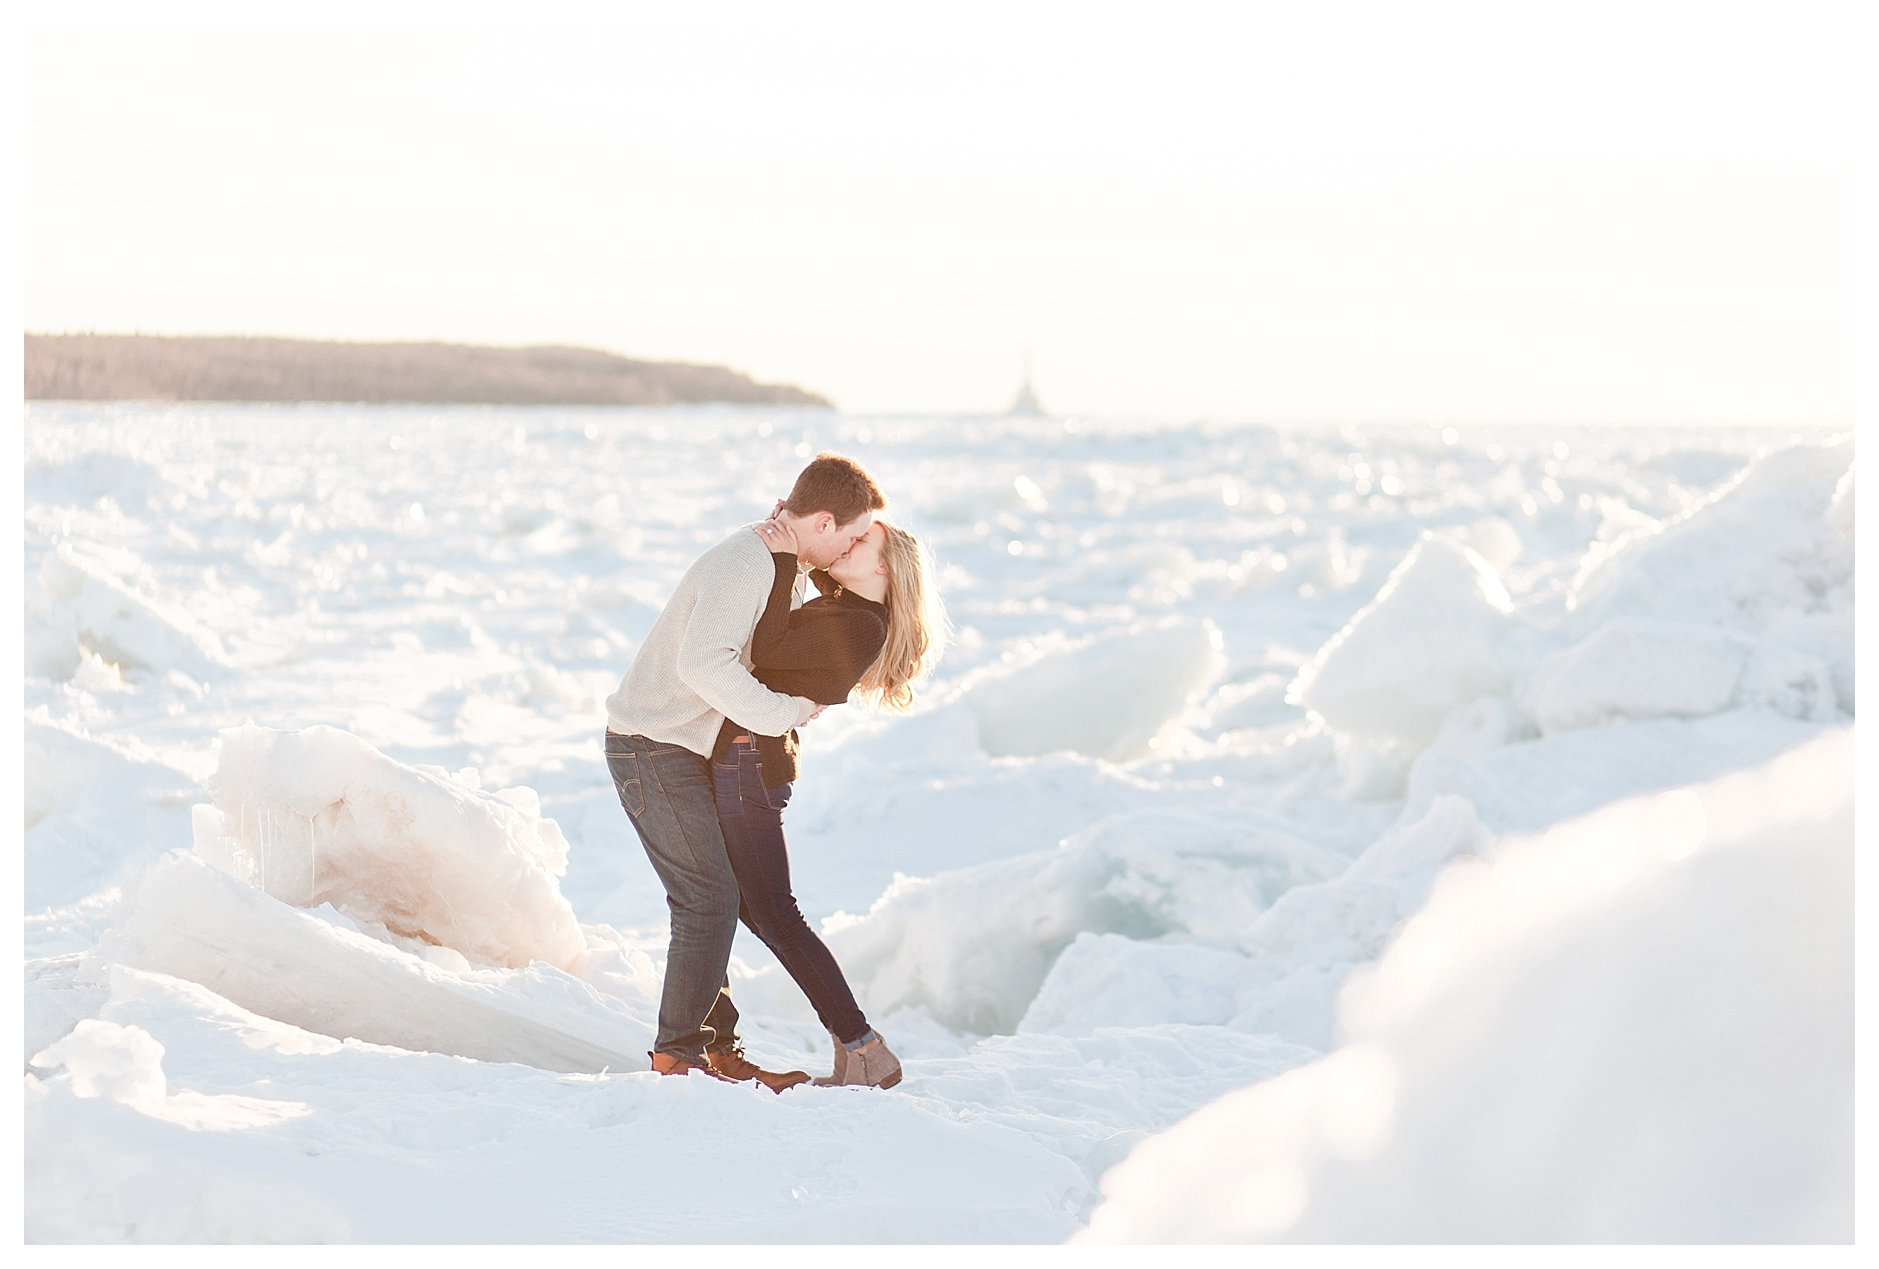 Jeff&Ashley Upper Peninsula Winter Engagement session_0060.jpg